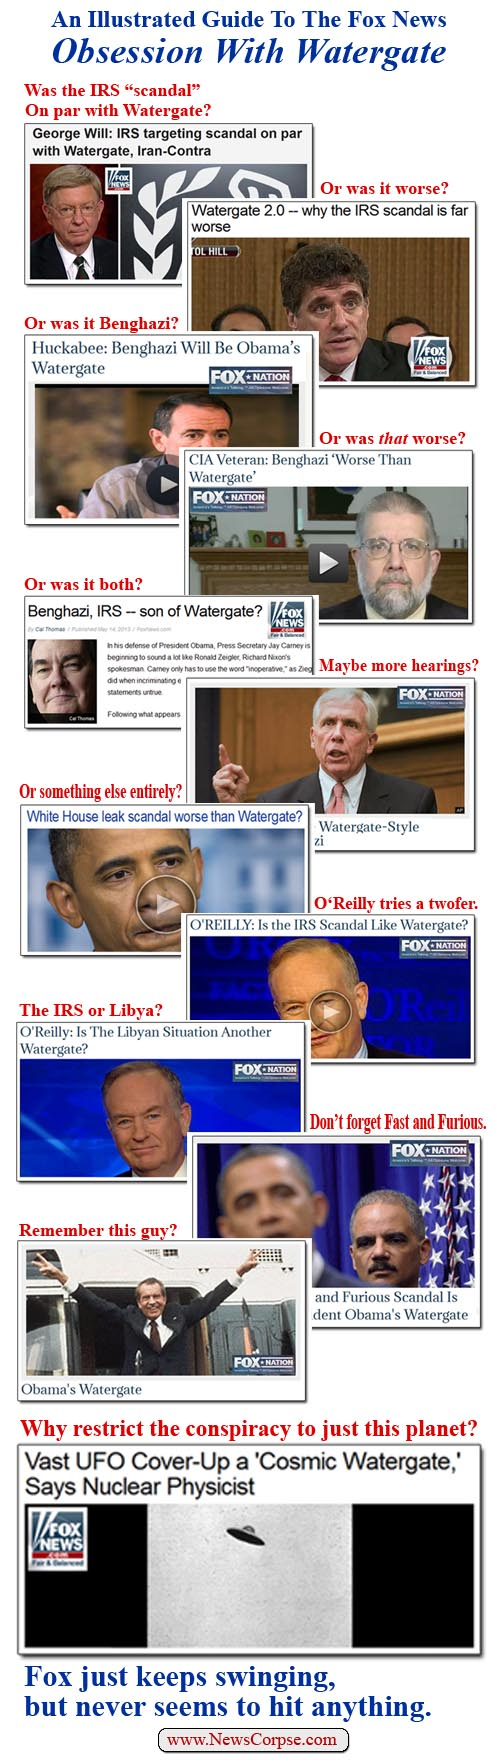 Fox News Watergate Obsession